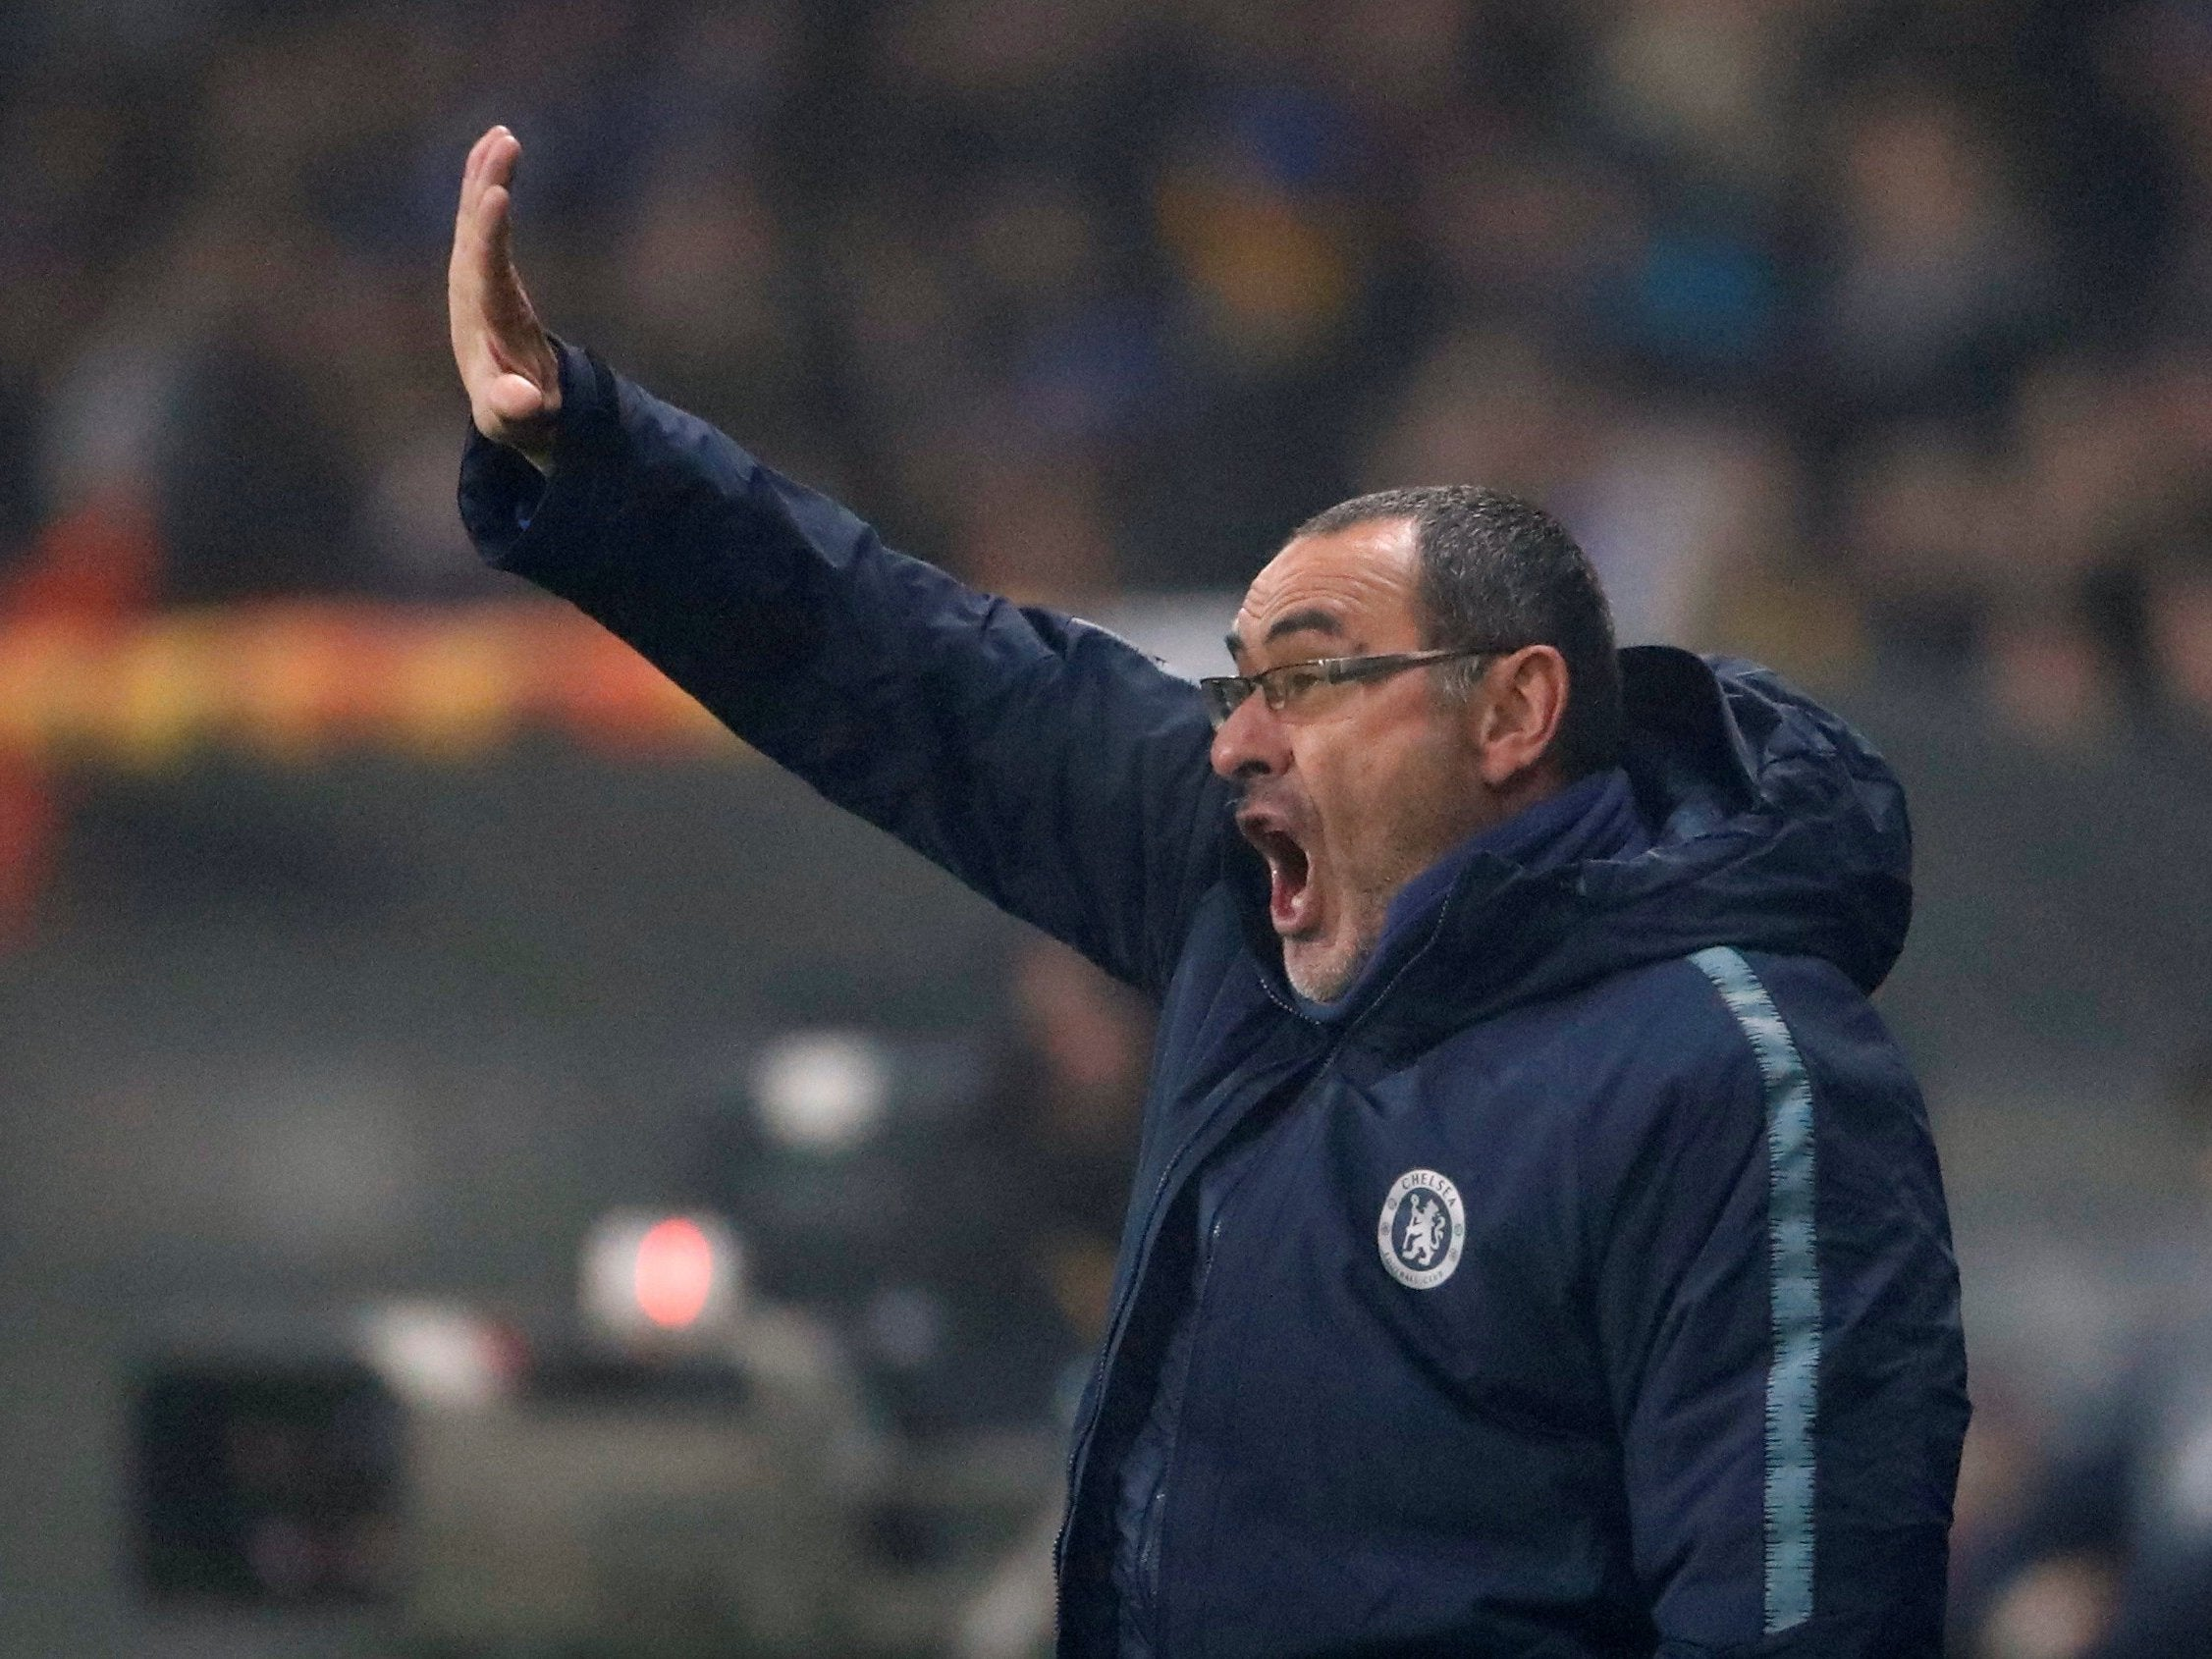 BATE Borisov vs. Chelsea: Maurizio Sarri fights a fever and asks his team to improve after a close win